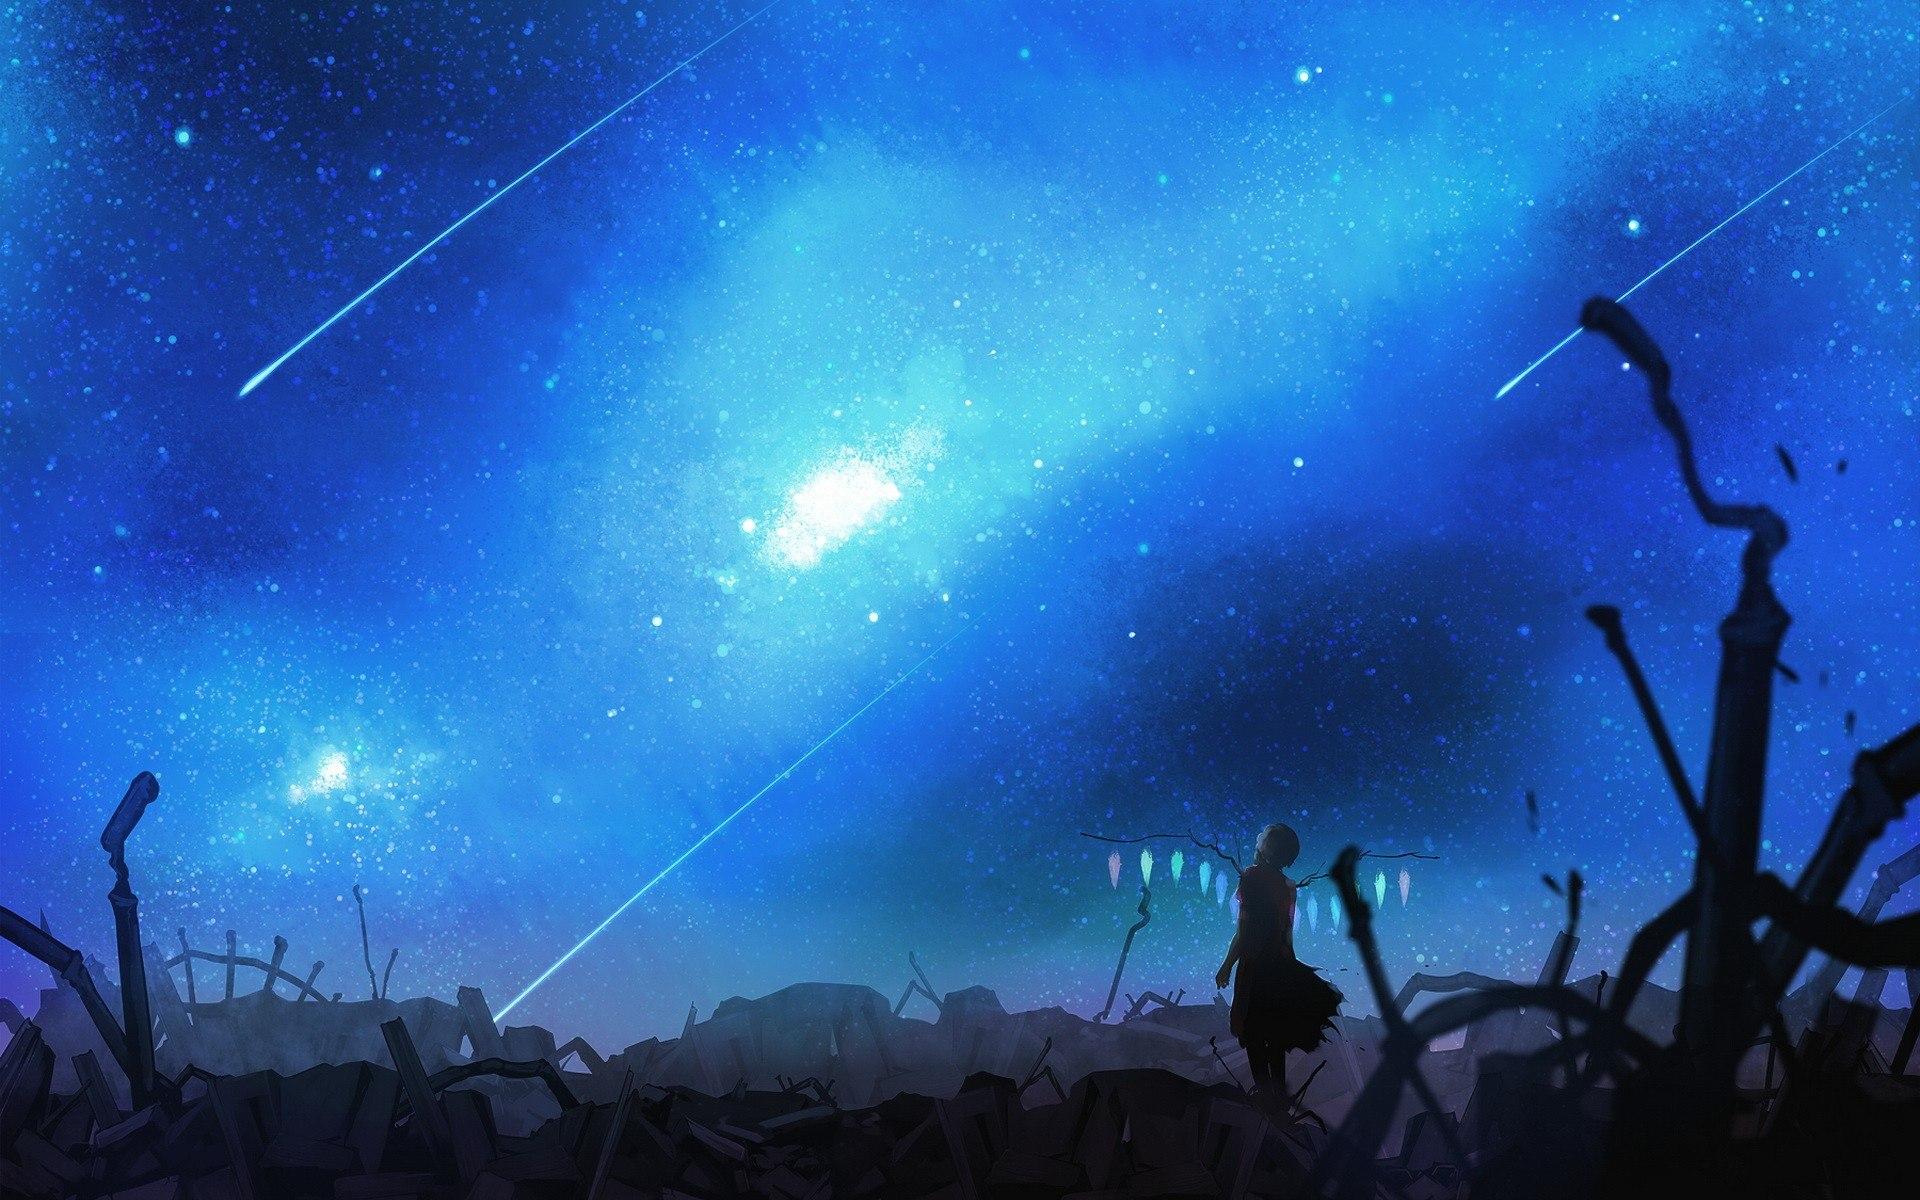 Blue Sky Anime Scenery Free Wallpaper Picture #72892 Wallpaper